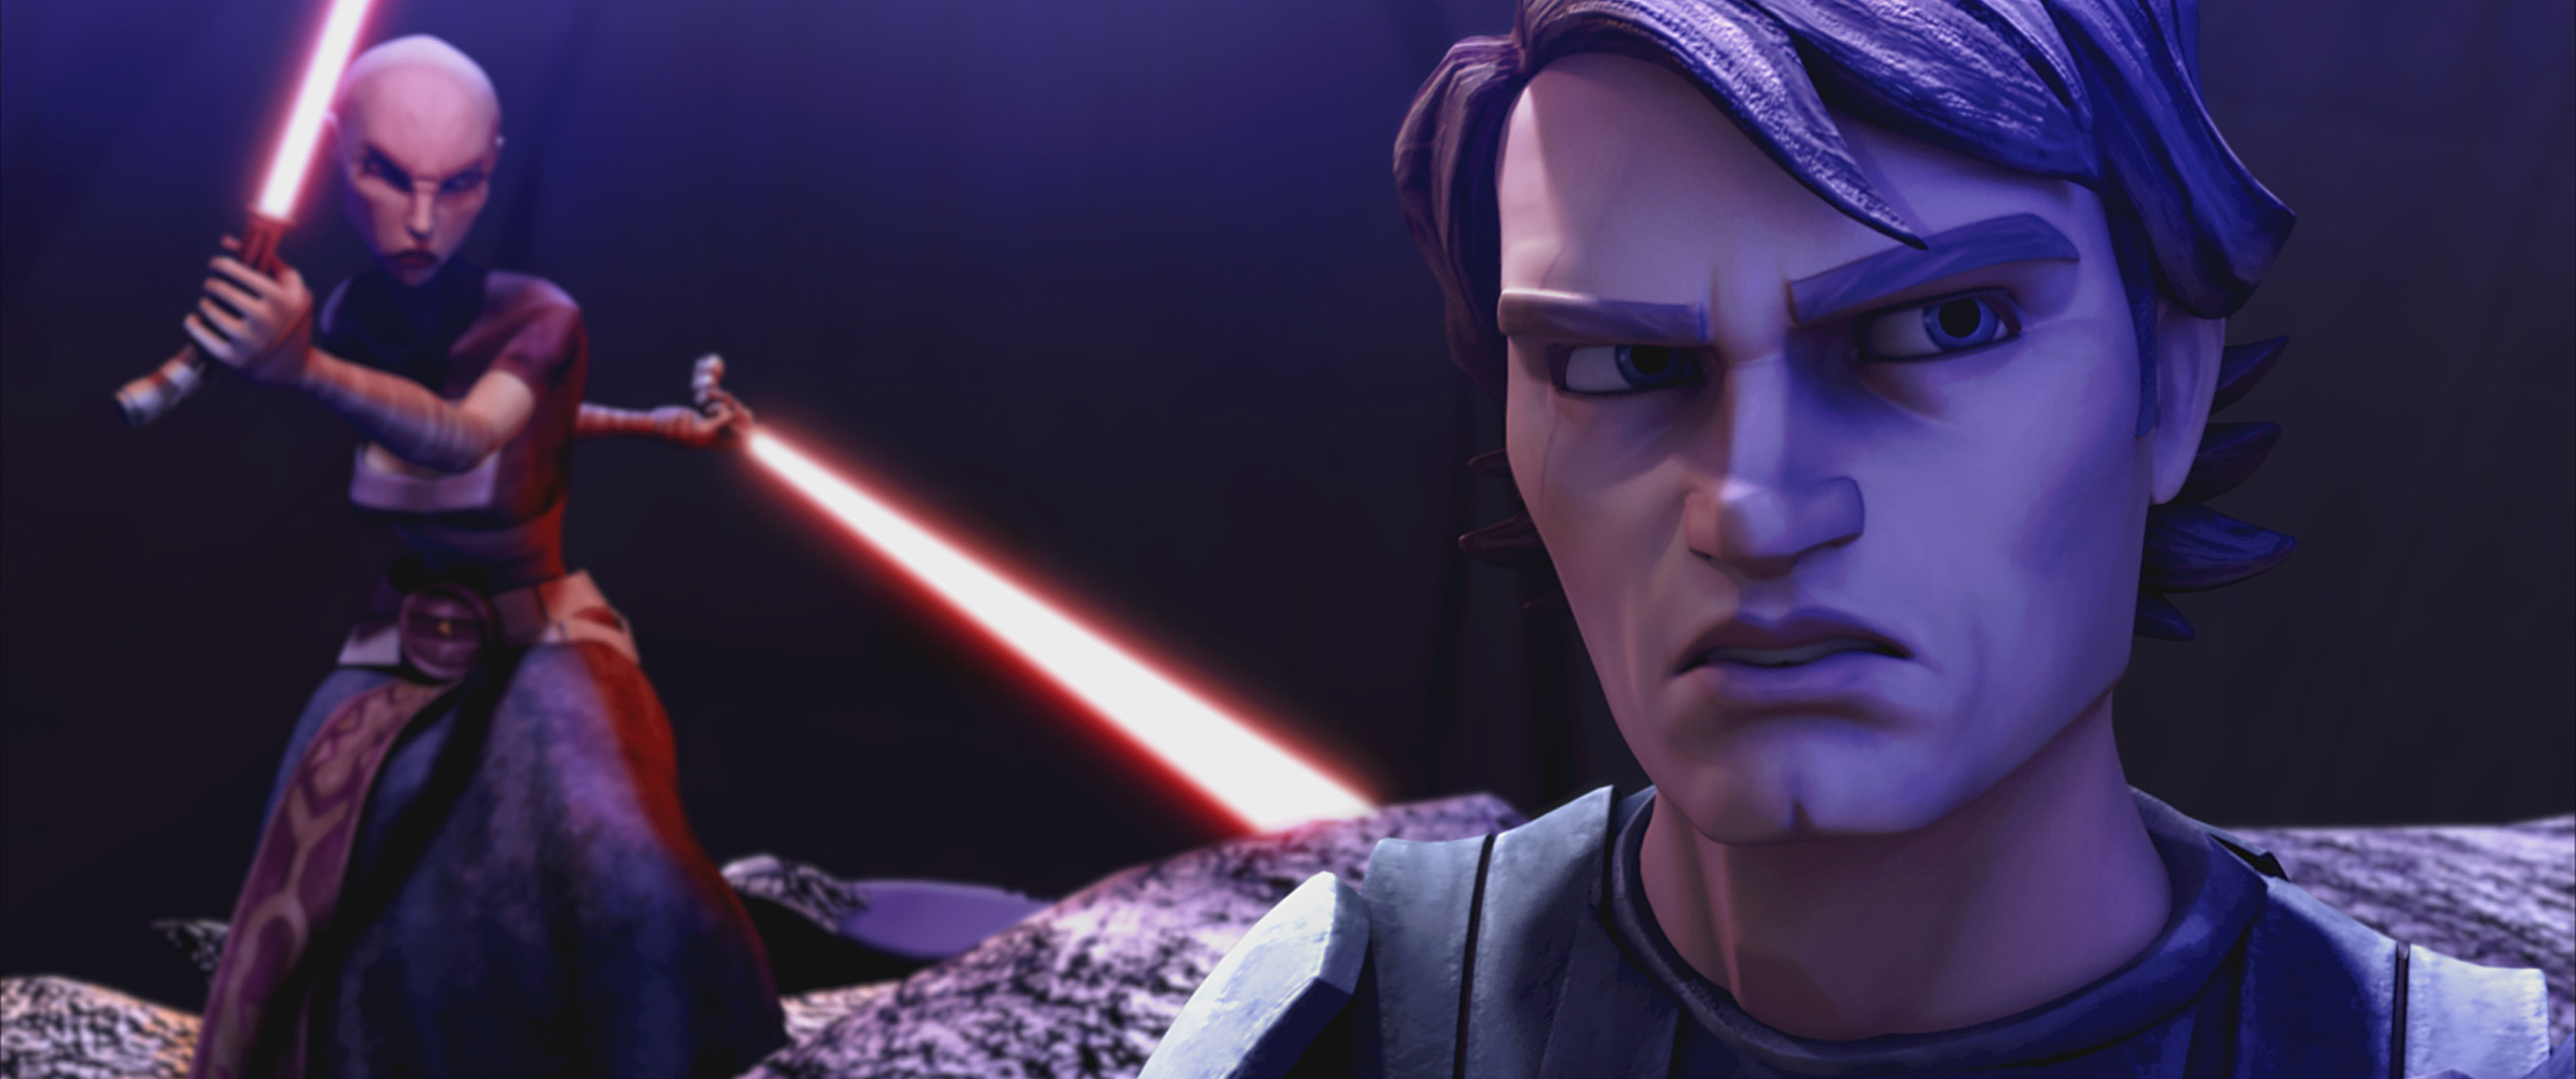 Anakin Skywalker (The Clone Wars)